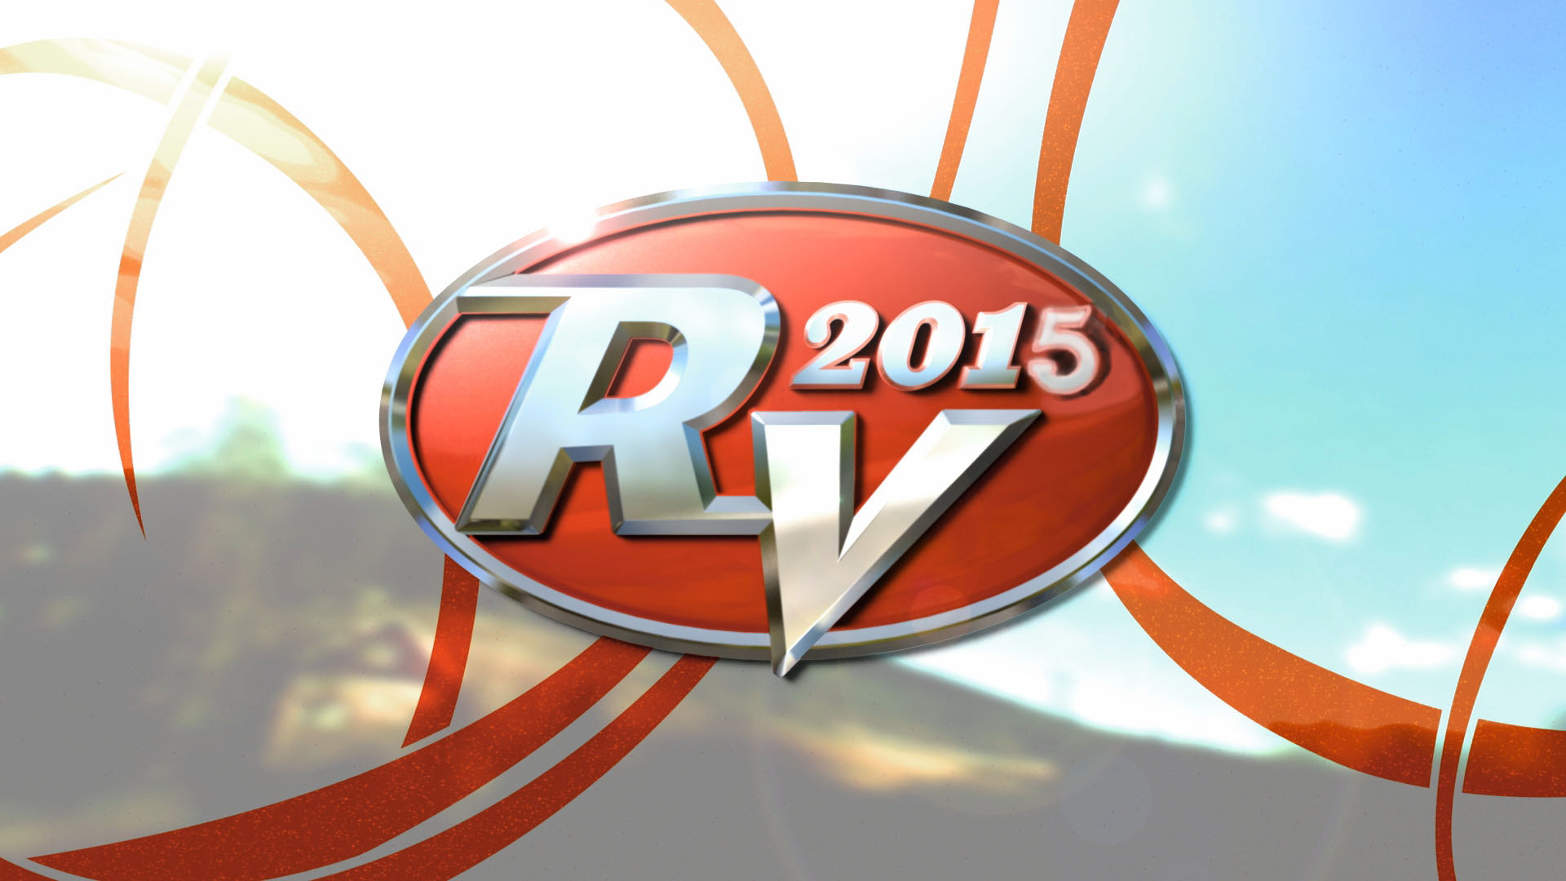 RV-2015